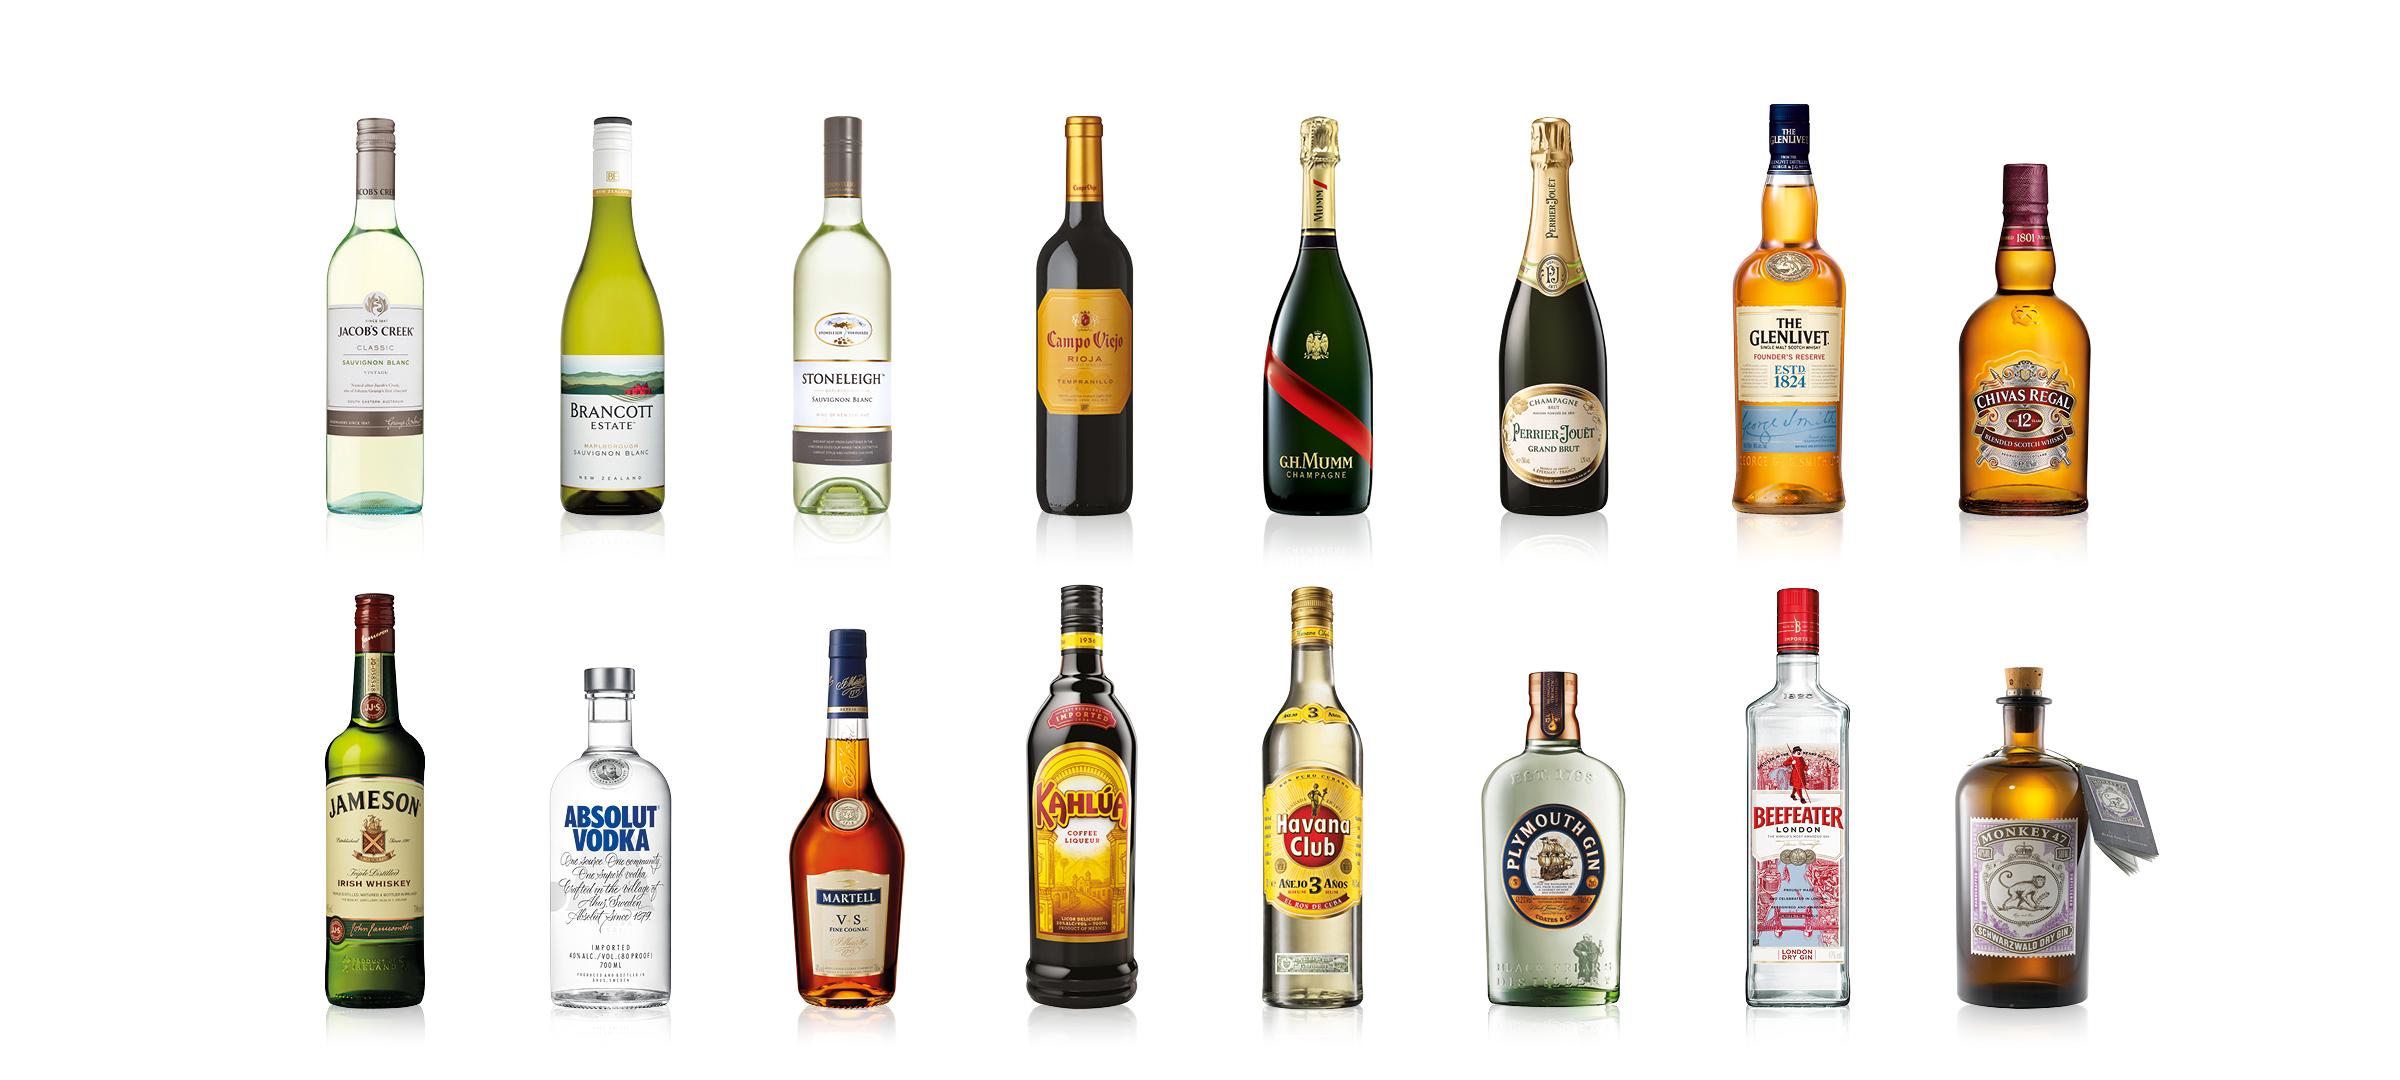 New Zealand Bottle Line Up